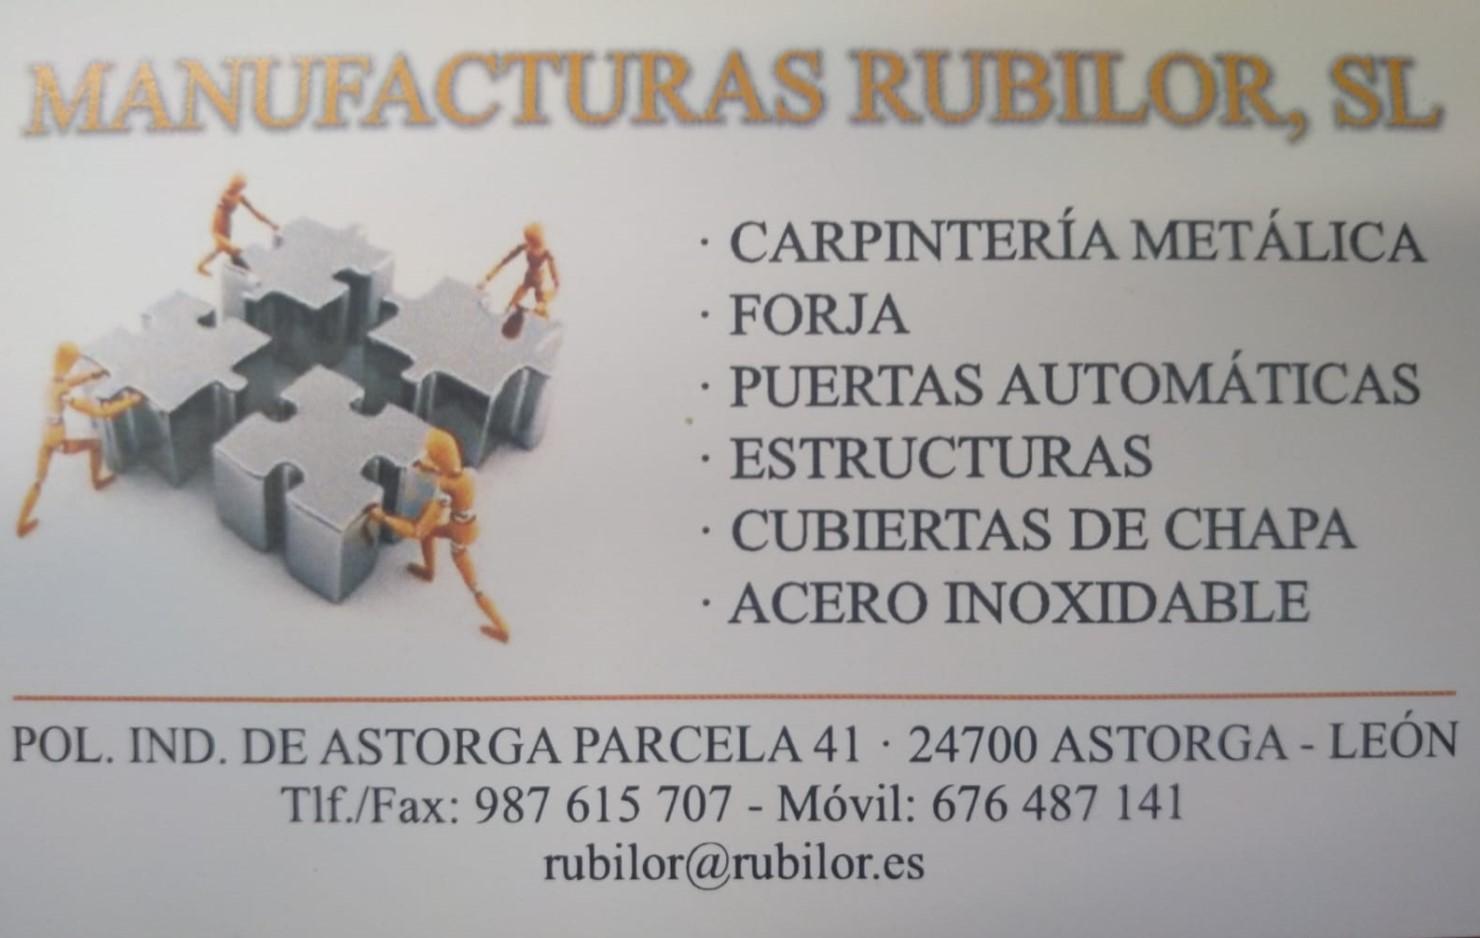 MANUFACTURAS RUBILOR, SL